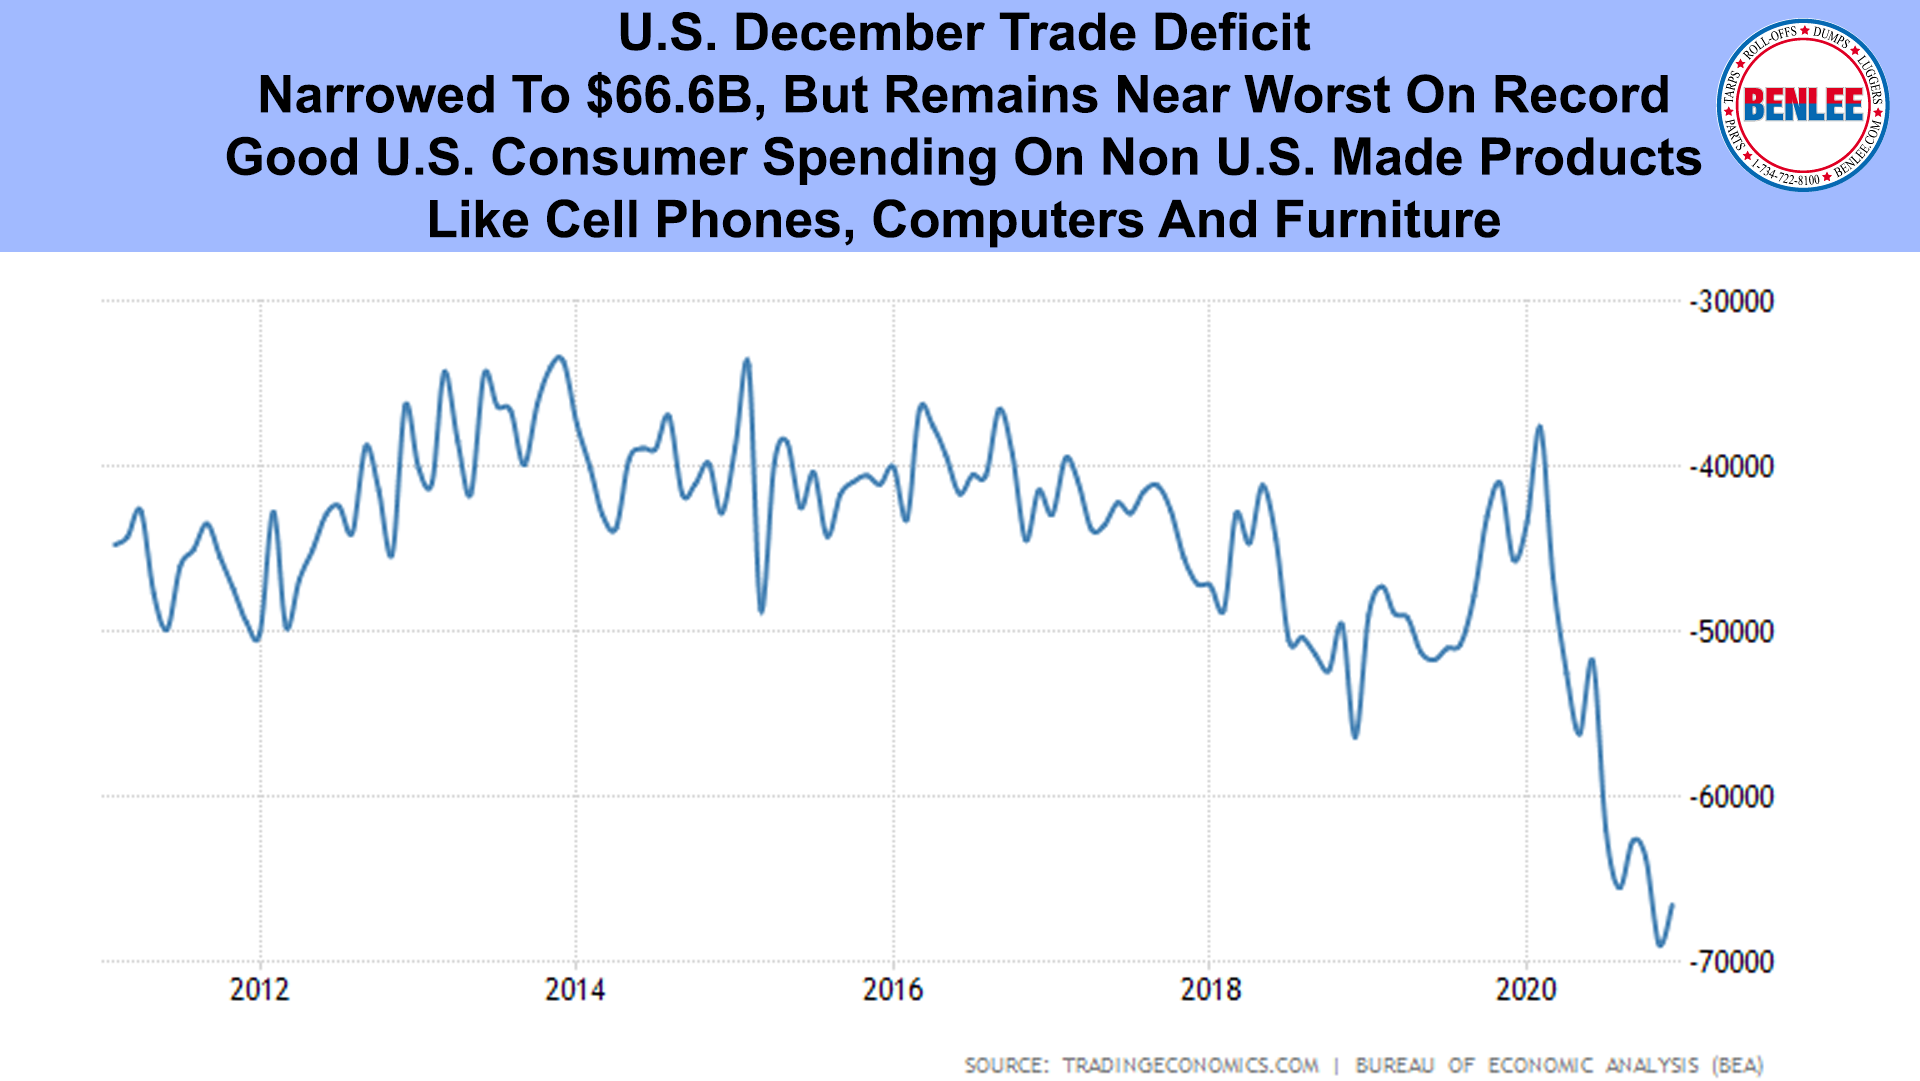 U.S. December Trade Deficit